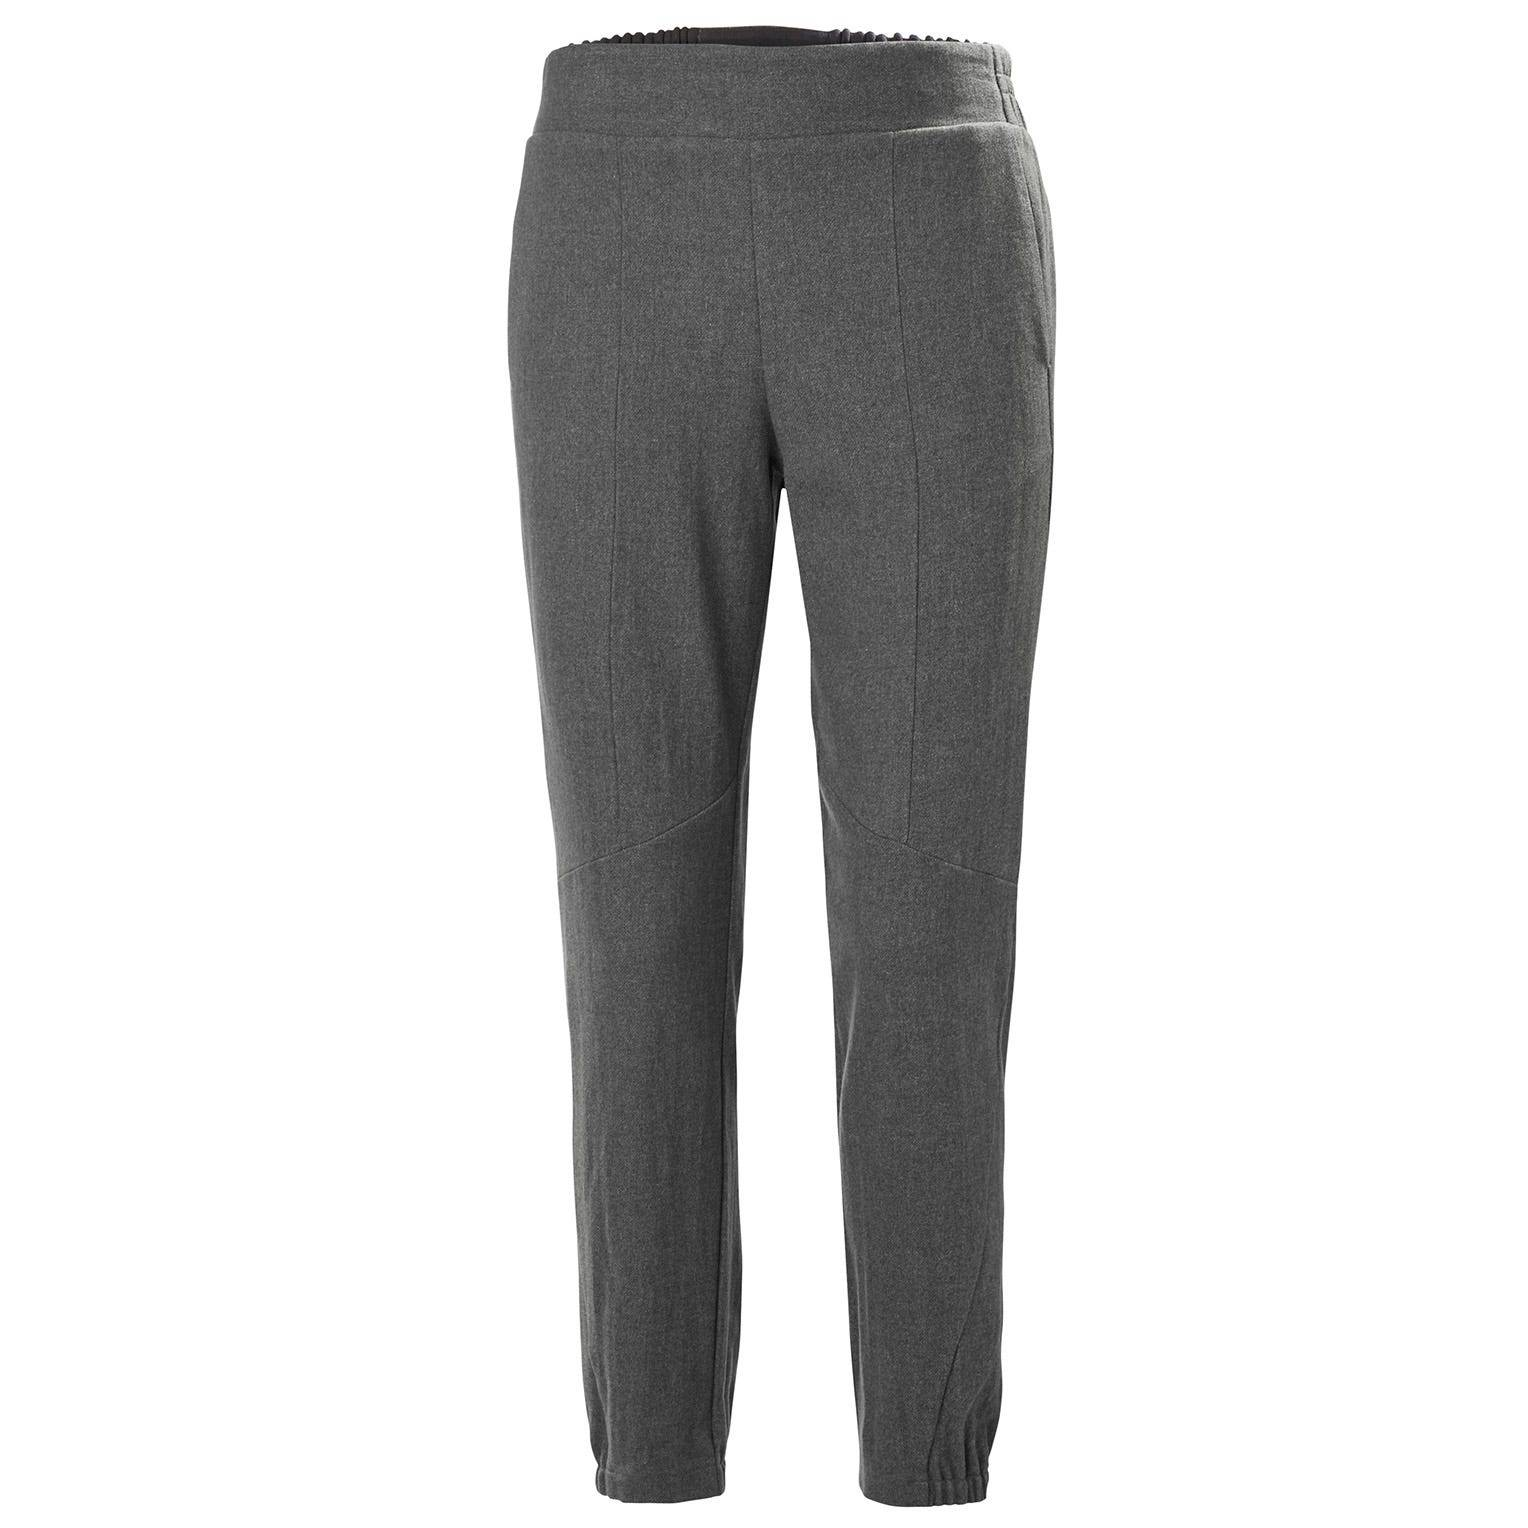 Helly Hansen W Wool Travel Pant Womens Hiking Grey M